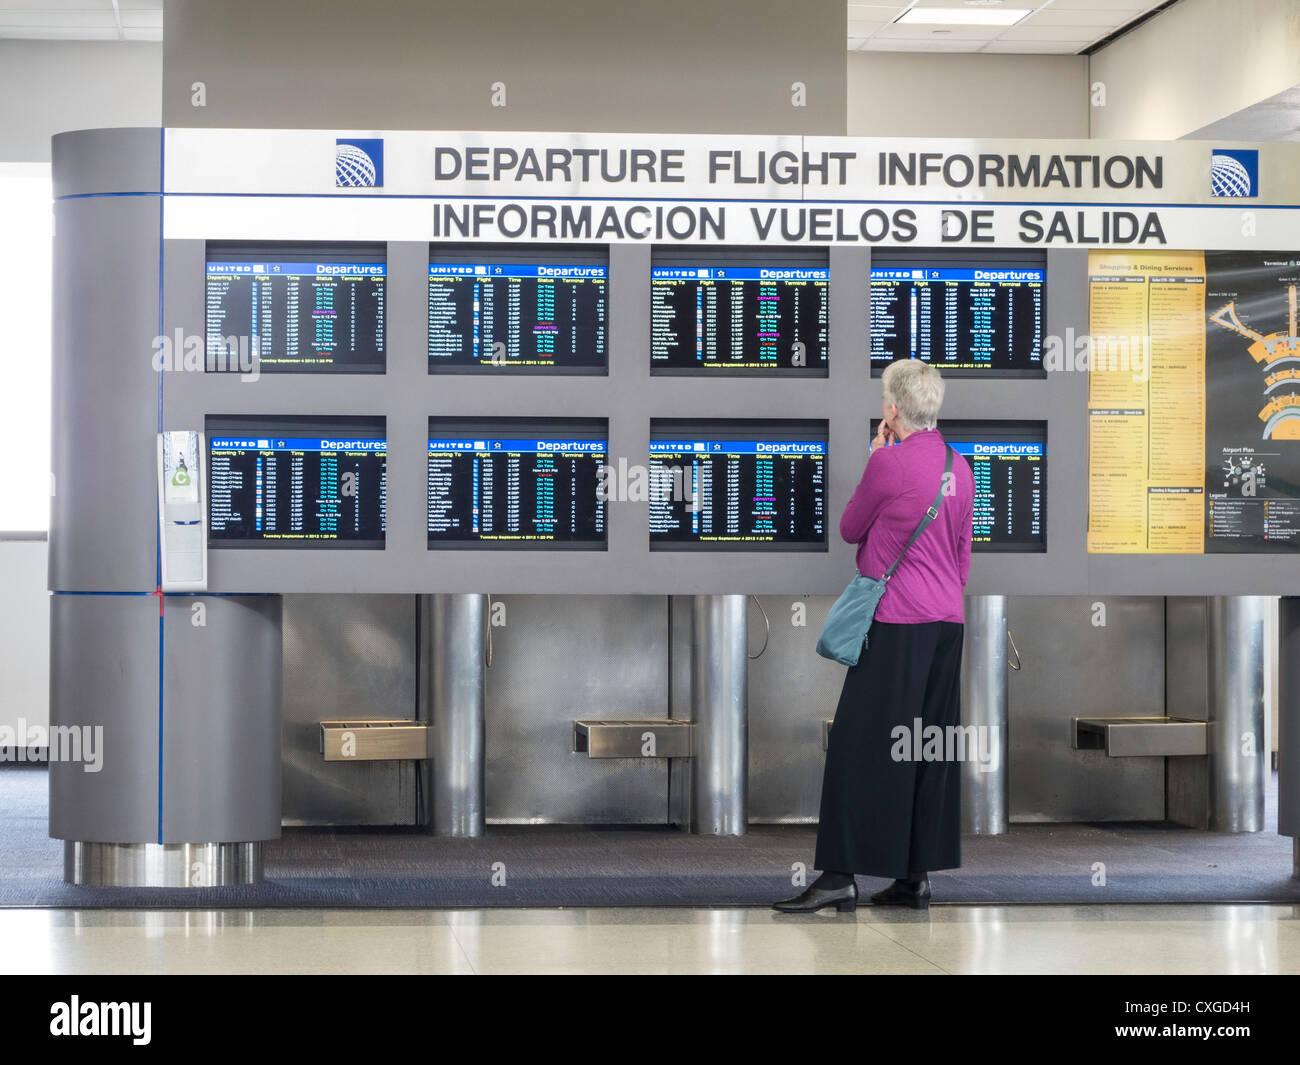 bilingual-departure-flight-information-b